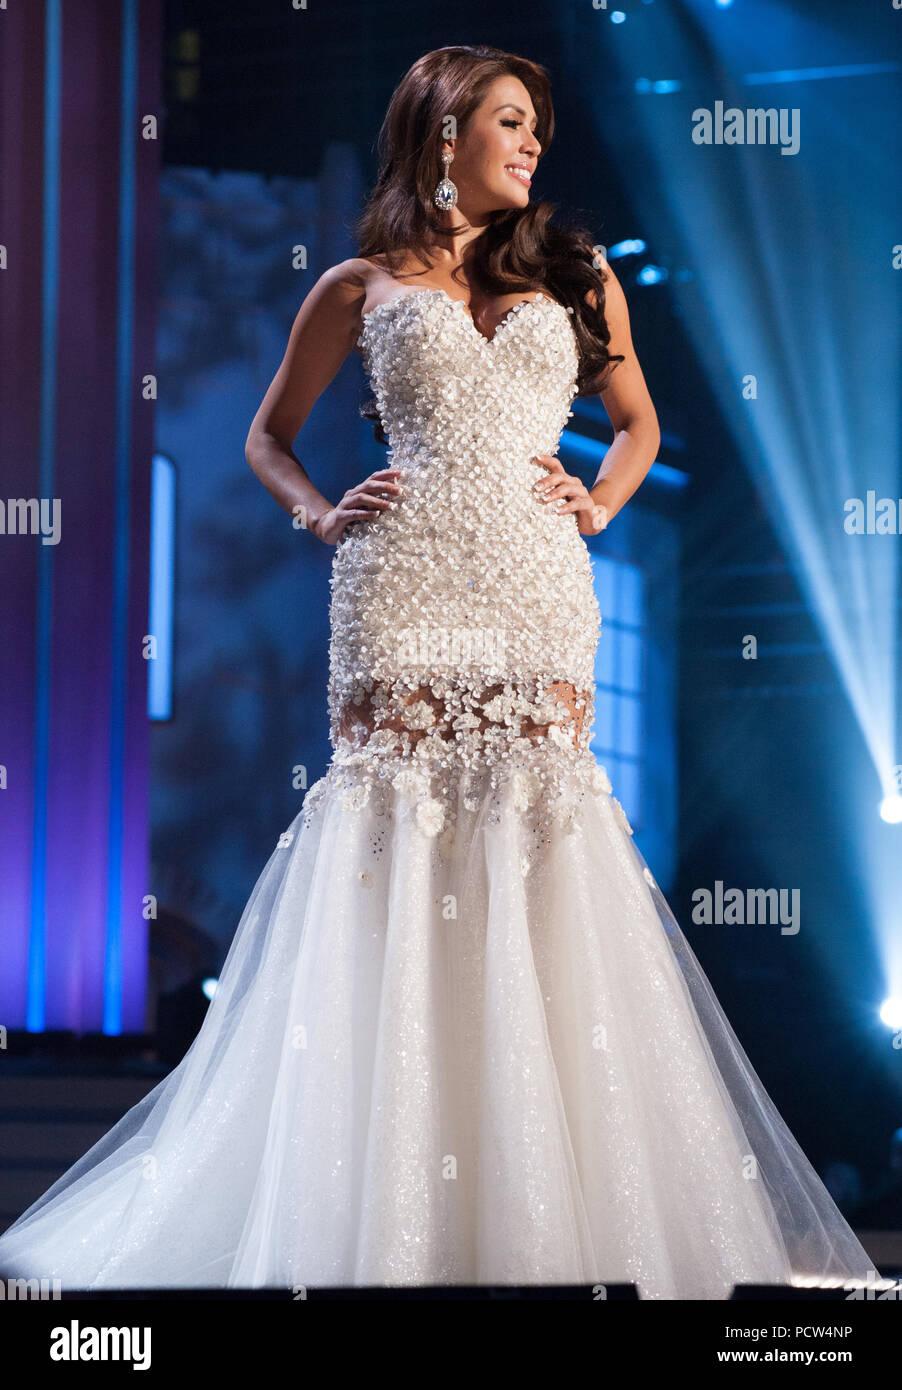 DORAL, FL - JANUARY 25: Mary Jean Lastimosa, Miss Philippines 2014 ...